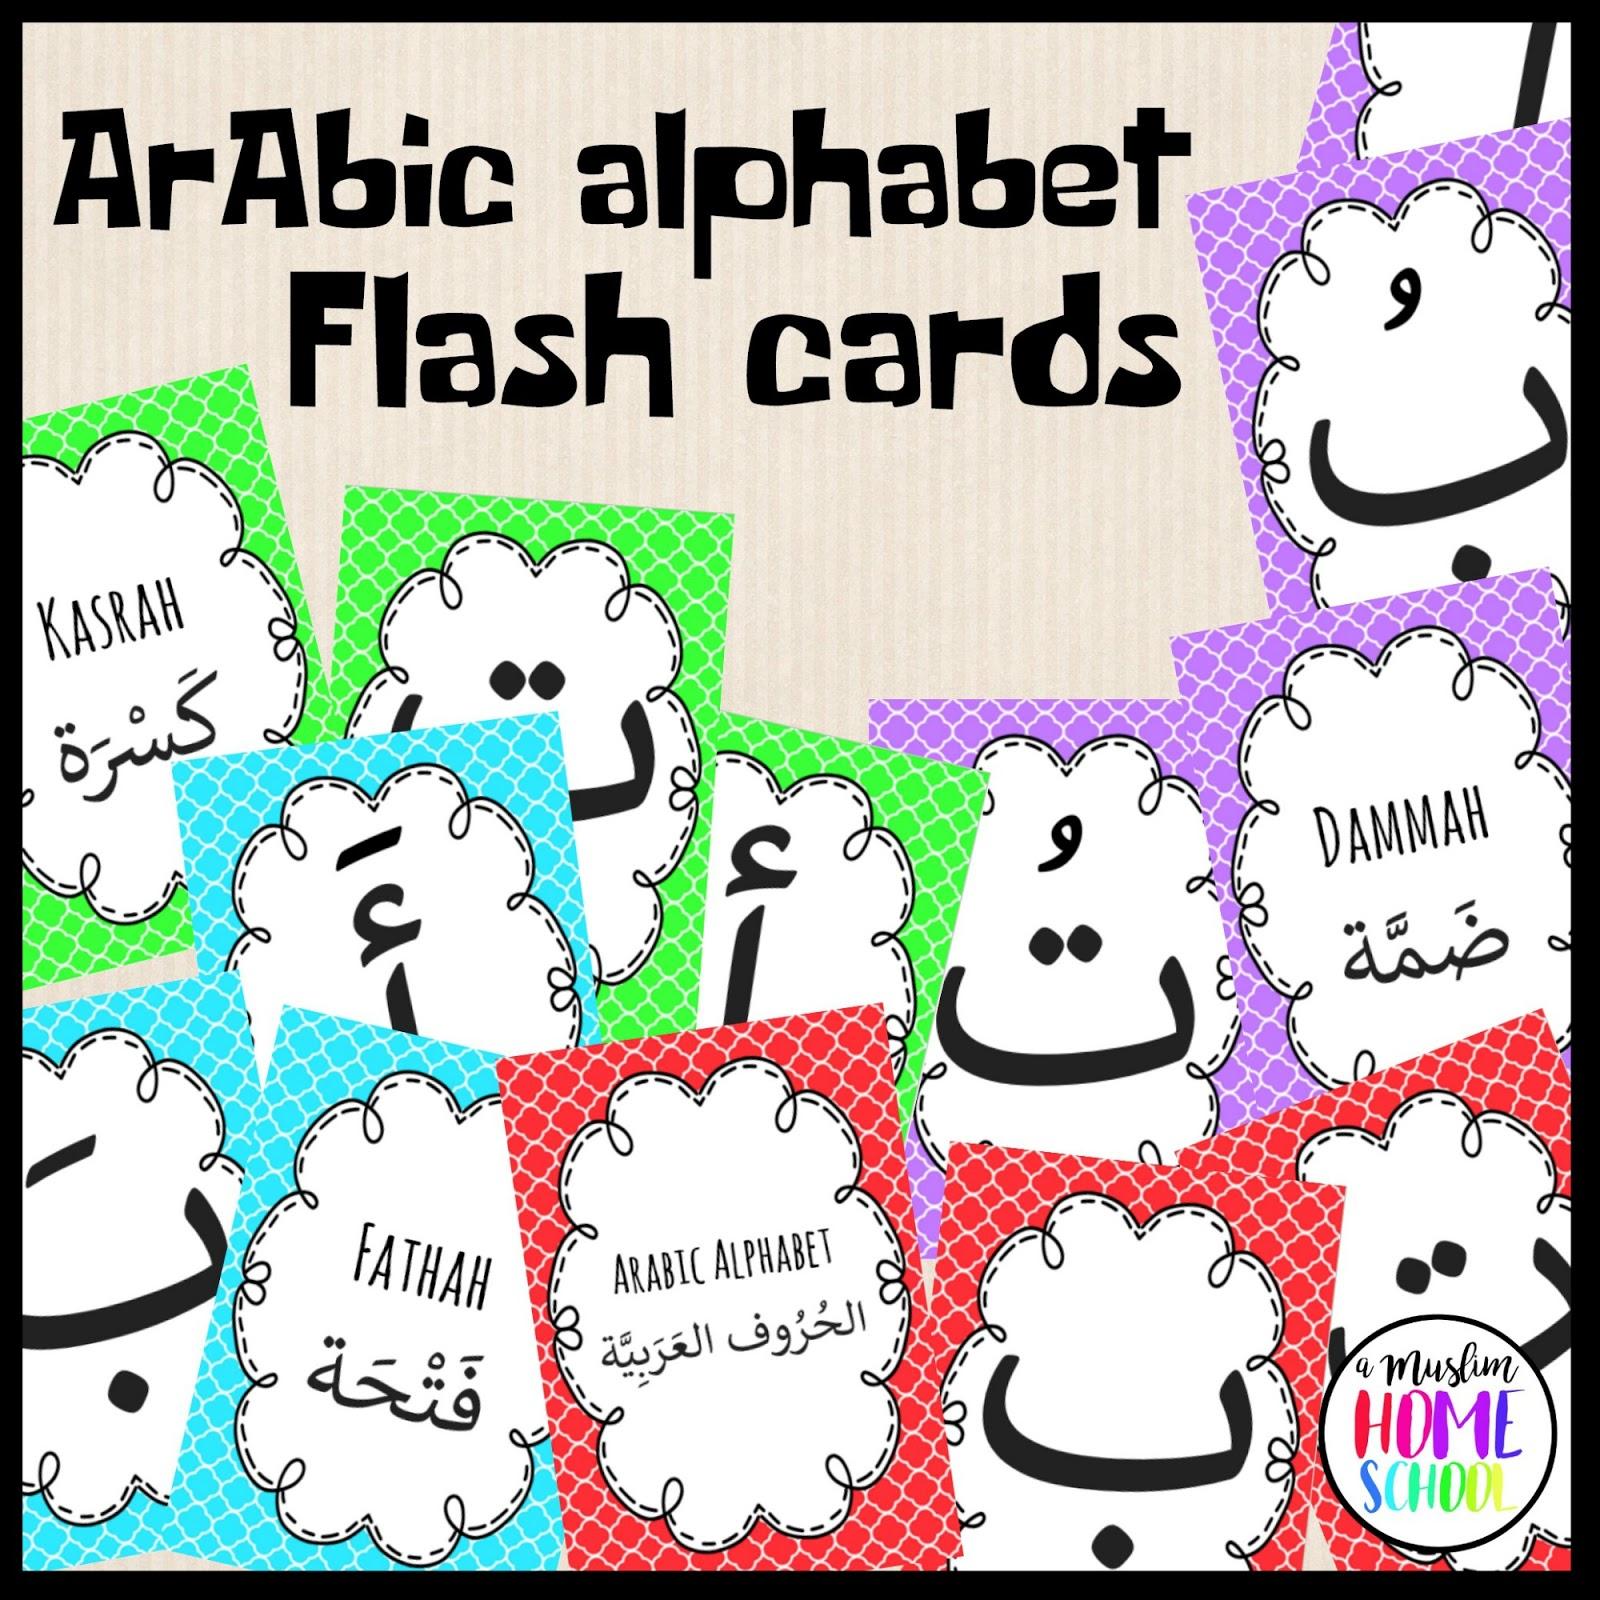 A Muslim Homeschool: Printable Arabic Alphabet Flashcard regarding Arabic Alphabet Poster Printable